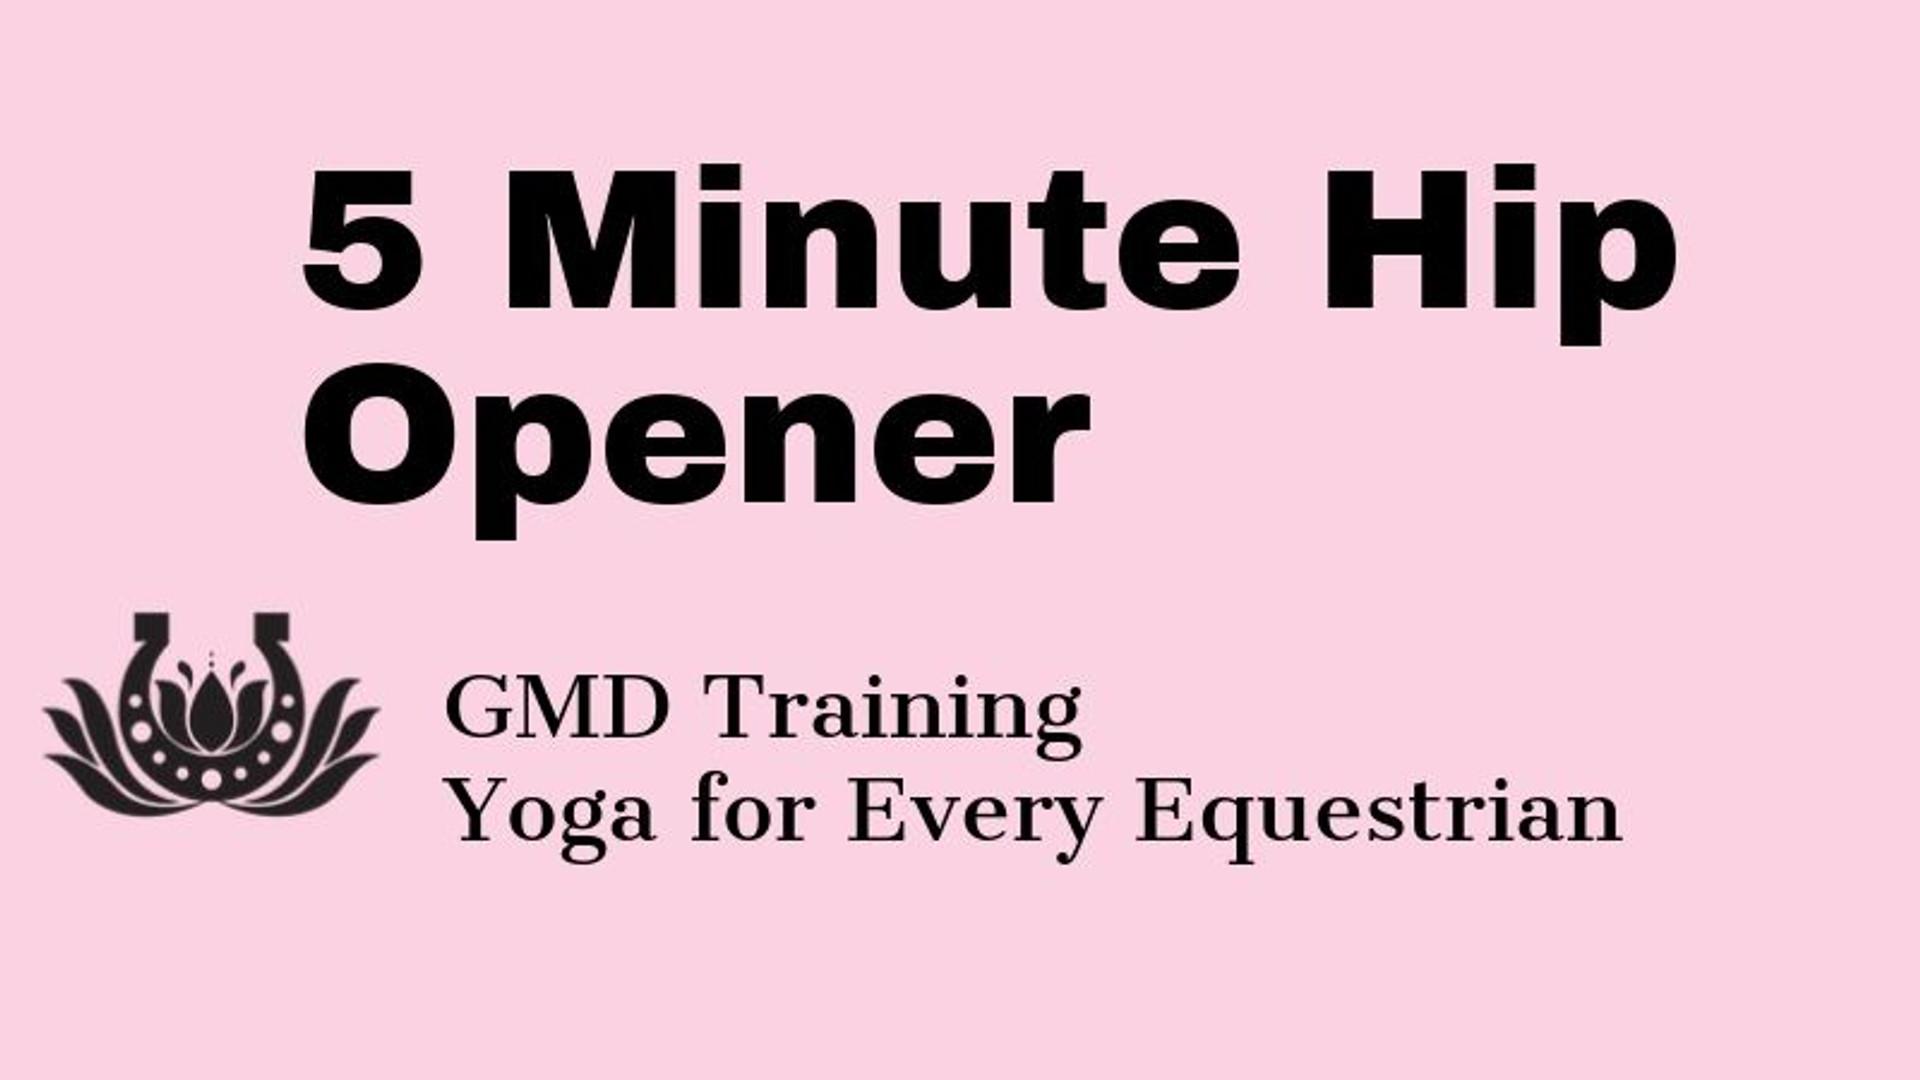 5 minute hip opener